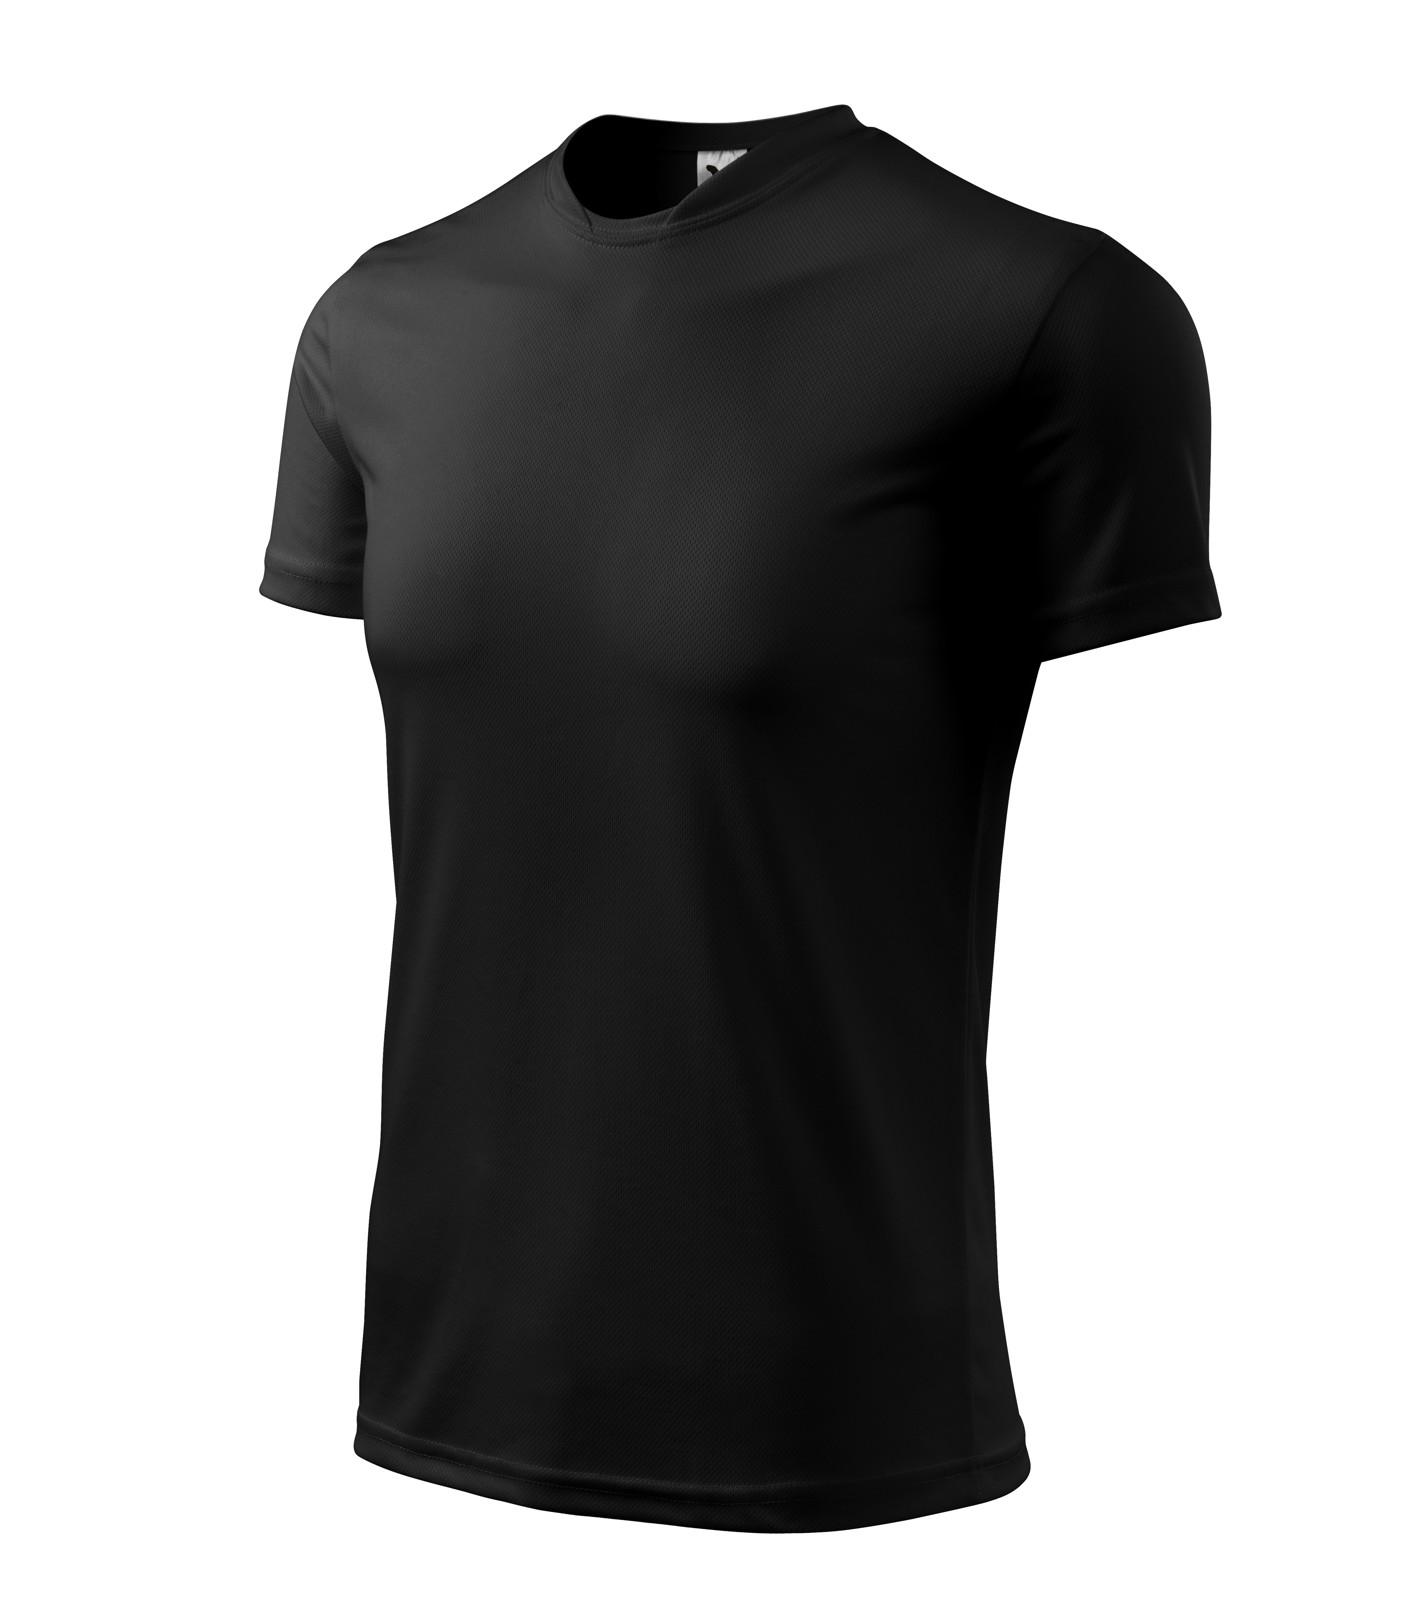 T-shirt Gents Malfini Fantasy - Black / 2XL